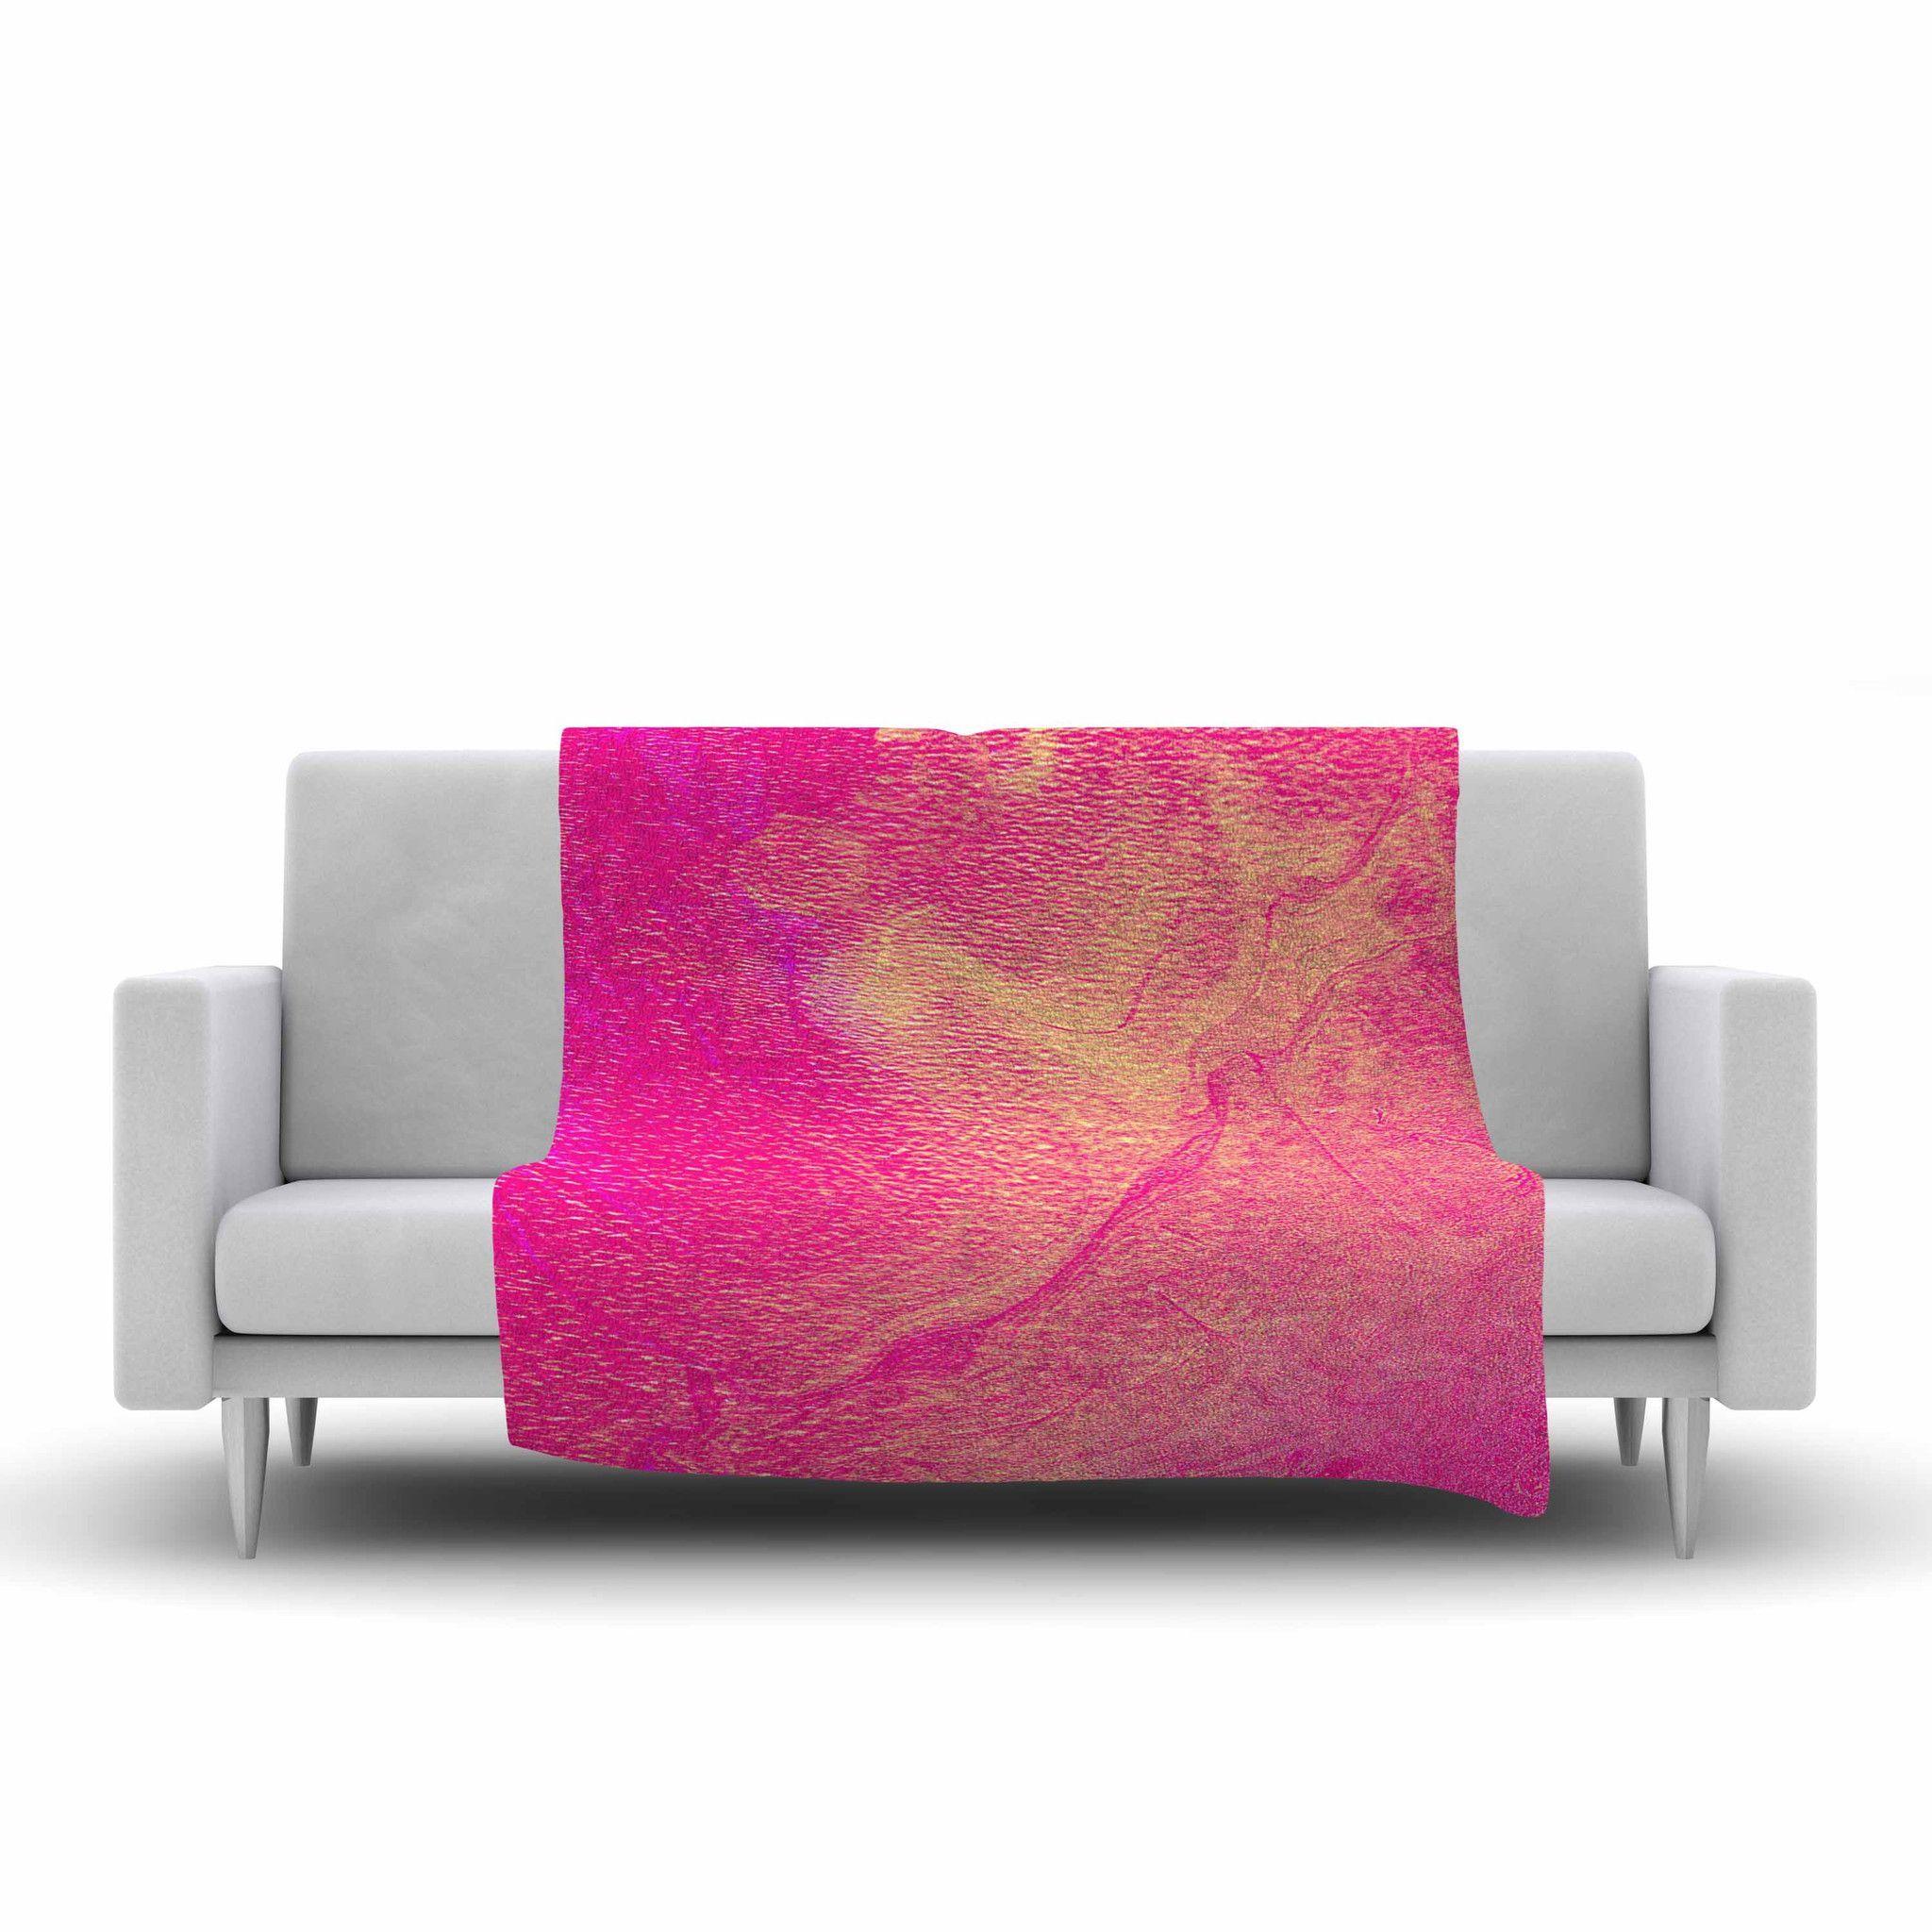 "Ashley Rice ""AC1"" Pink Watercolor Fleece Throw Blanket"